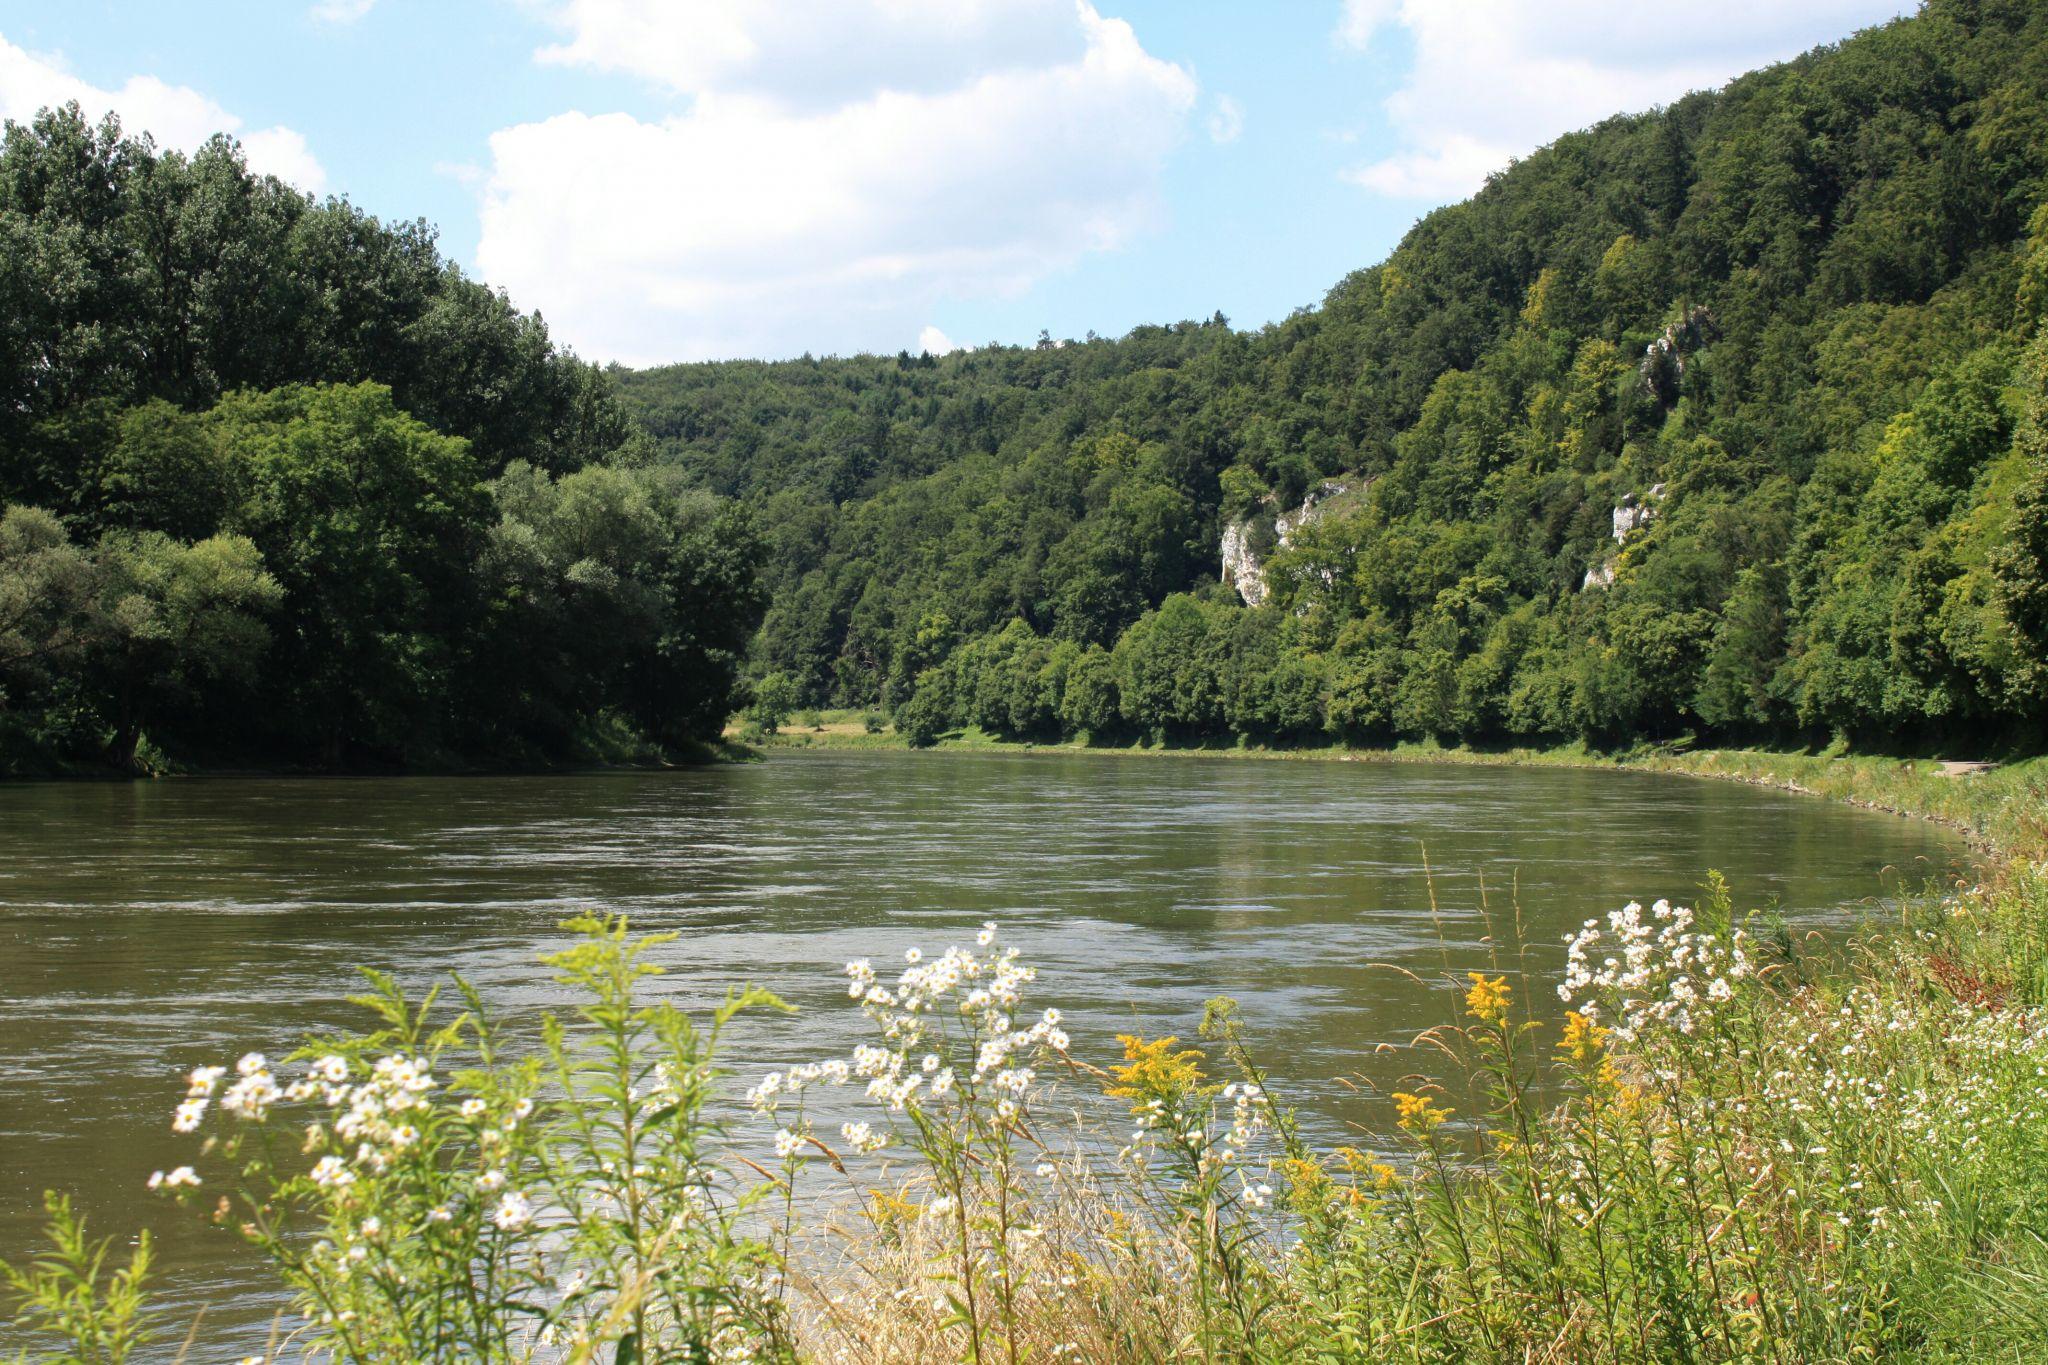 Donau bei Kehlheim, Germany